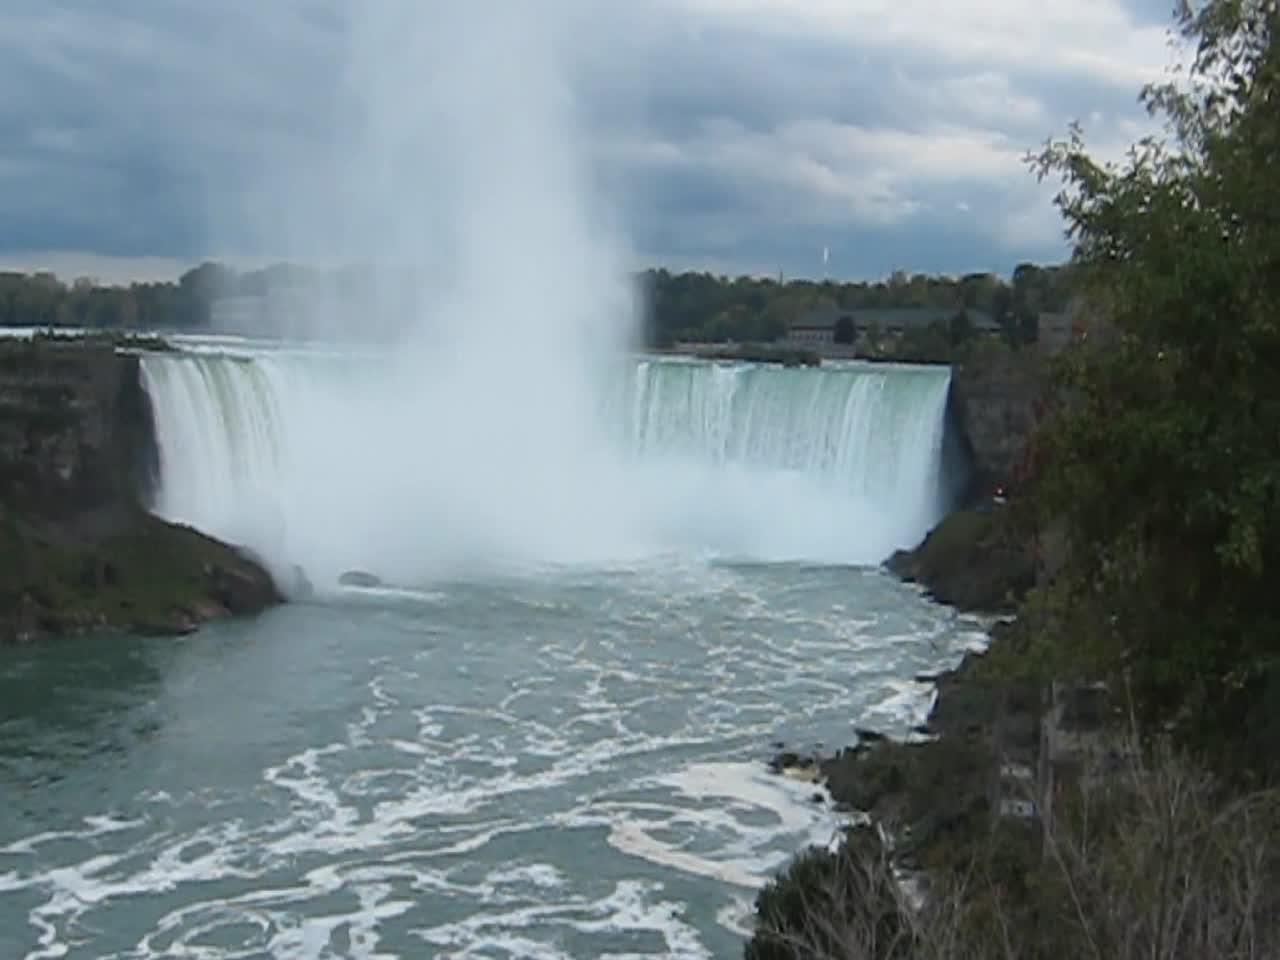 Niagara Falls 10 Oct 2014